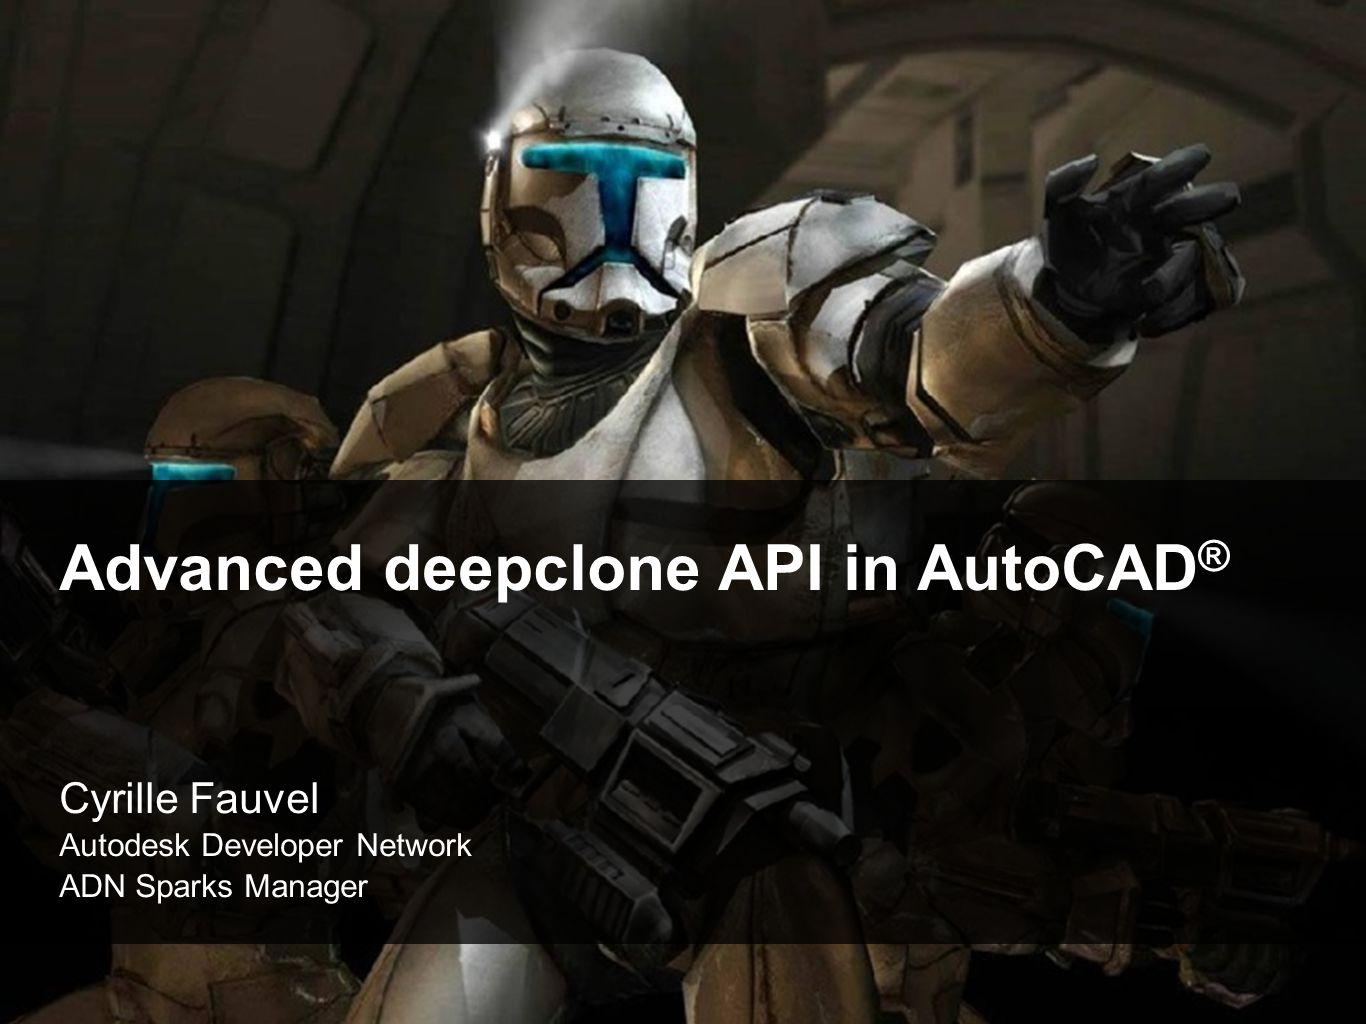 Advanced deepclone API in AutoCAD®